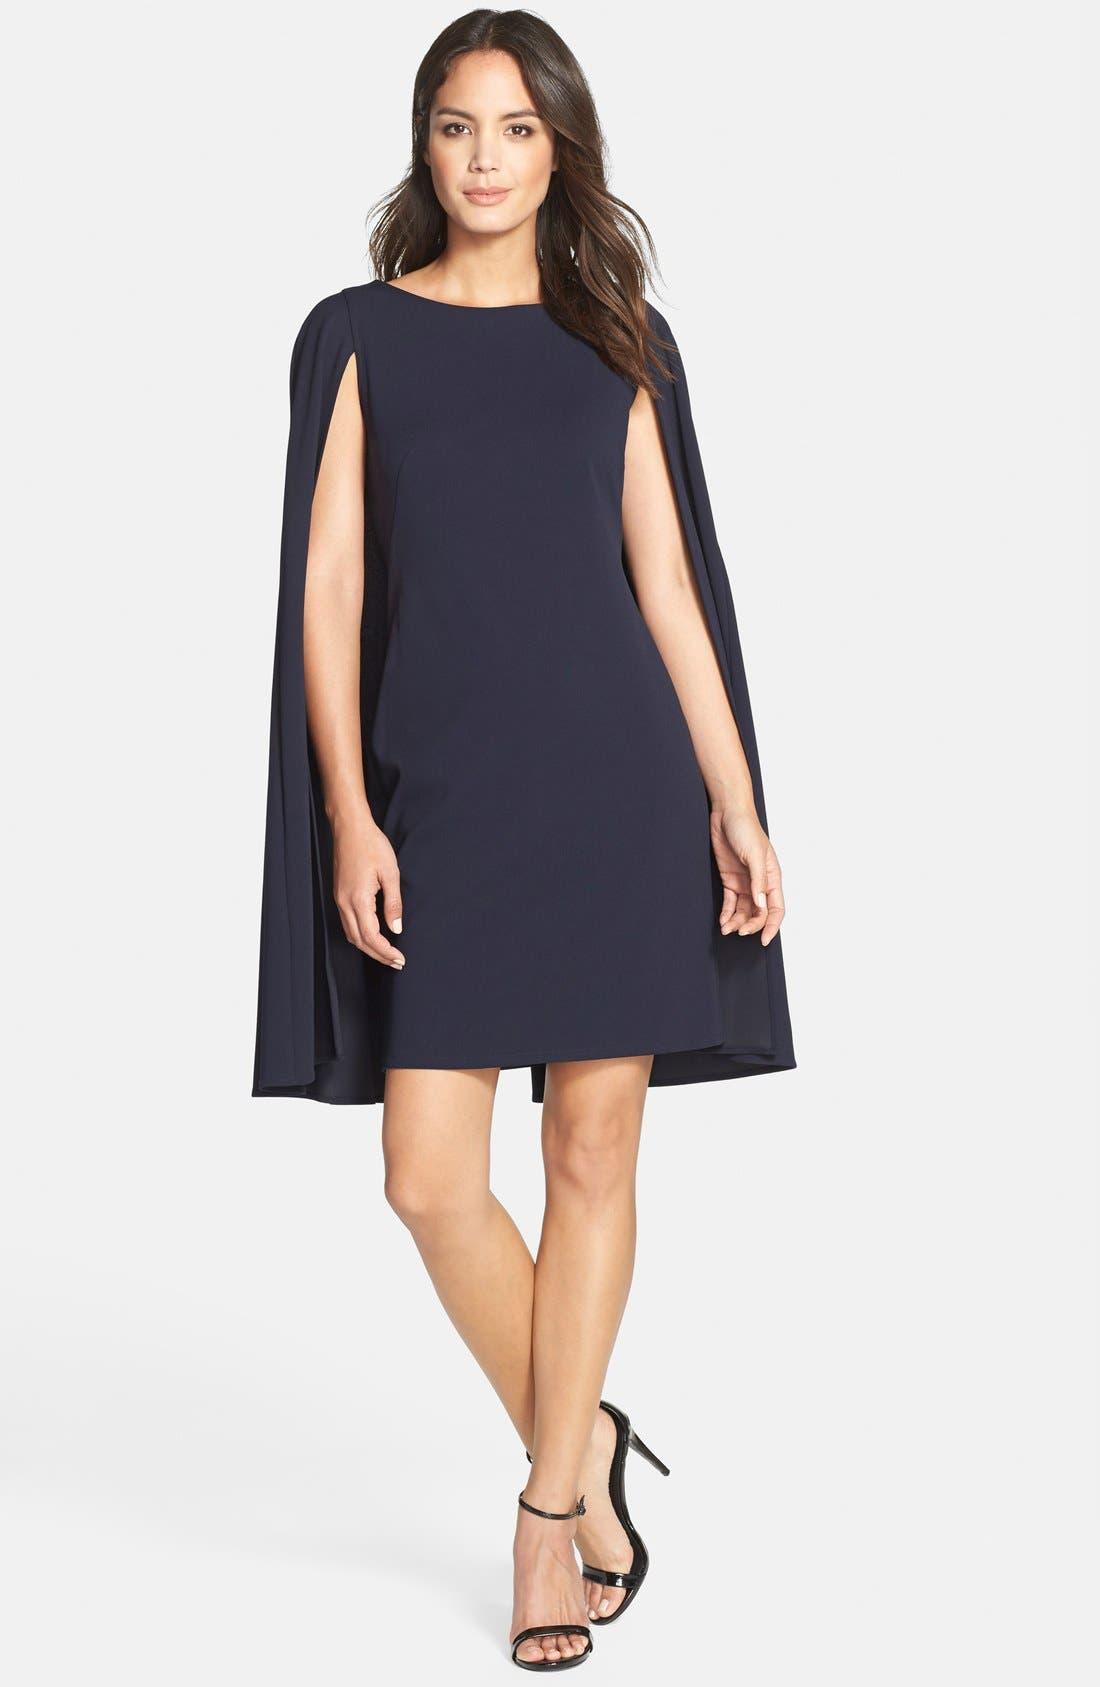 ADRIANNA PAPELL,                             Cape Sheath Dress,                             Alternate thumbnail 4, color,                             412